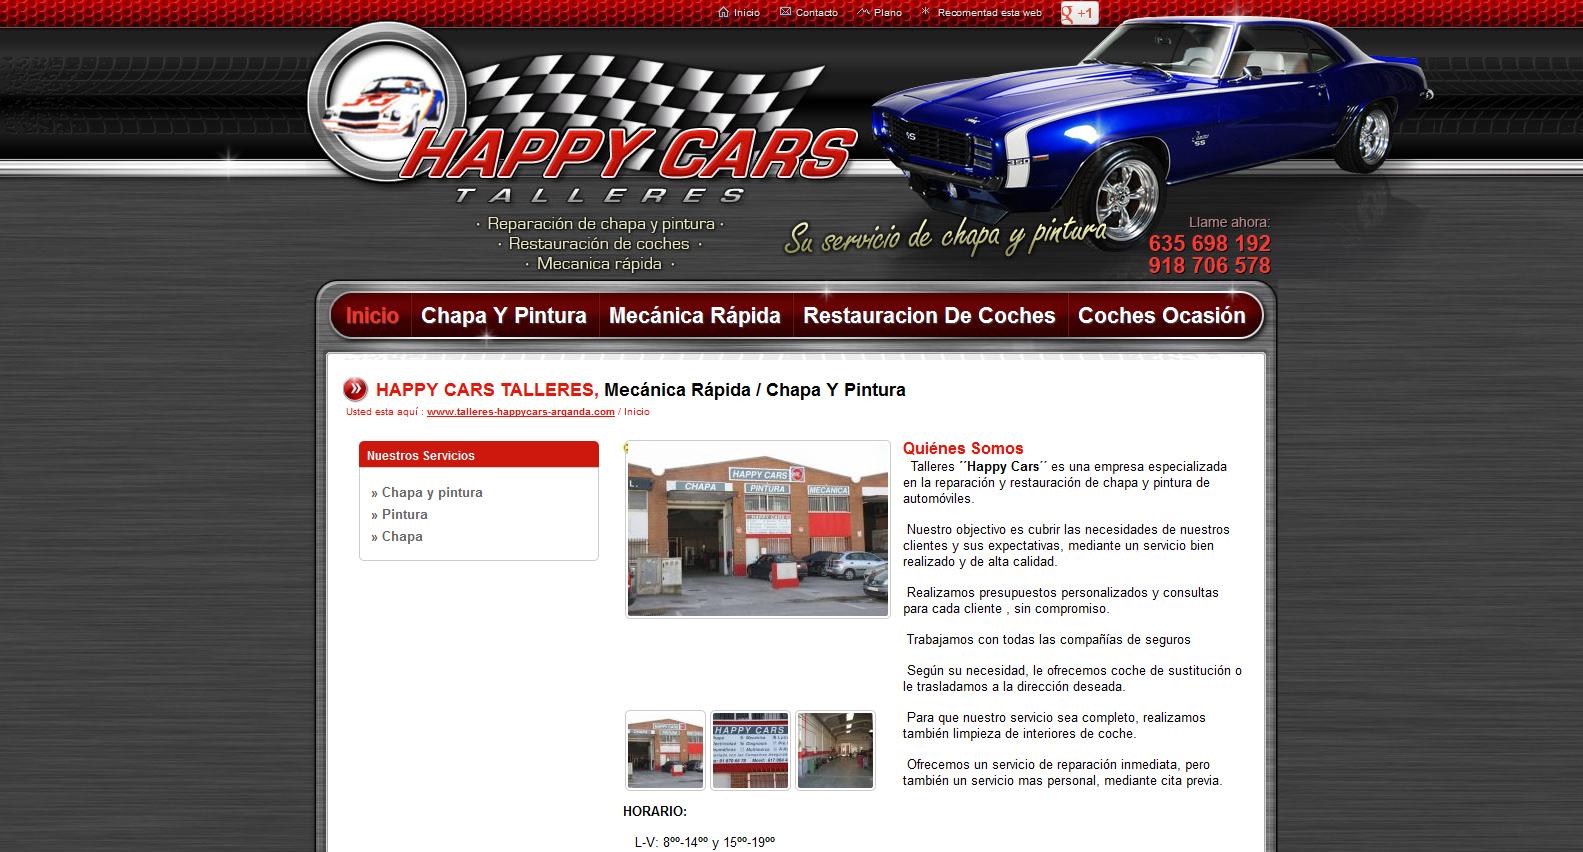 Happy Cars